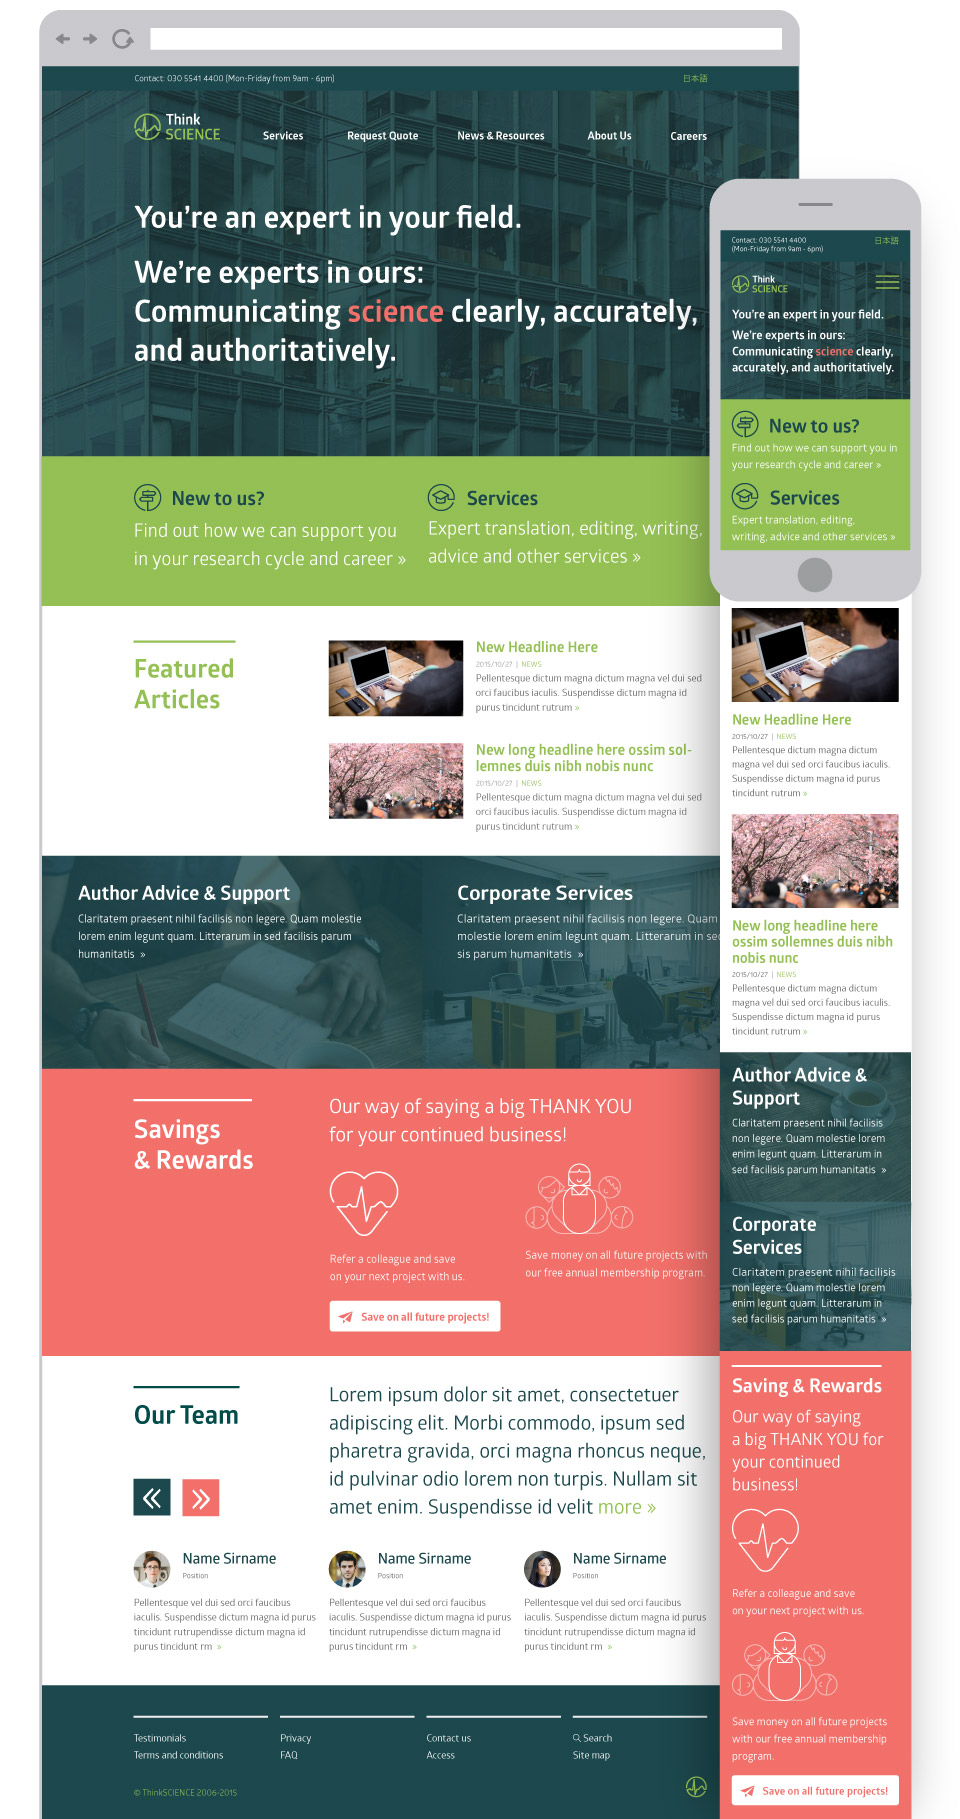 ThinkSCIENCE - expert translation and editing - logo, identity, illustration, website and print design